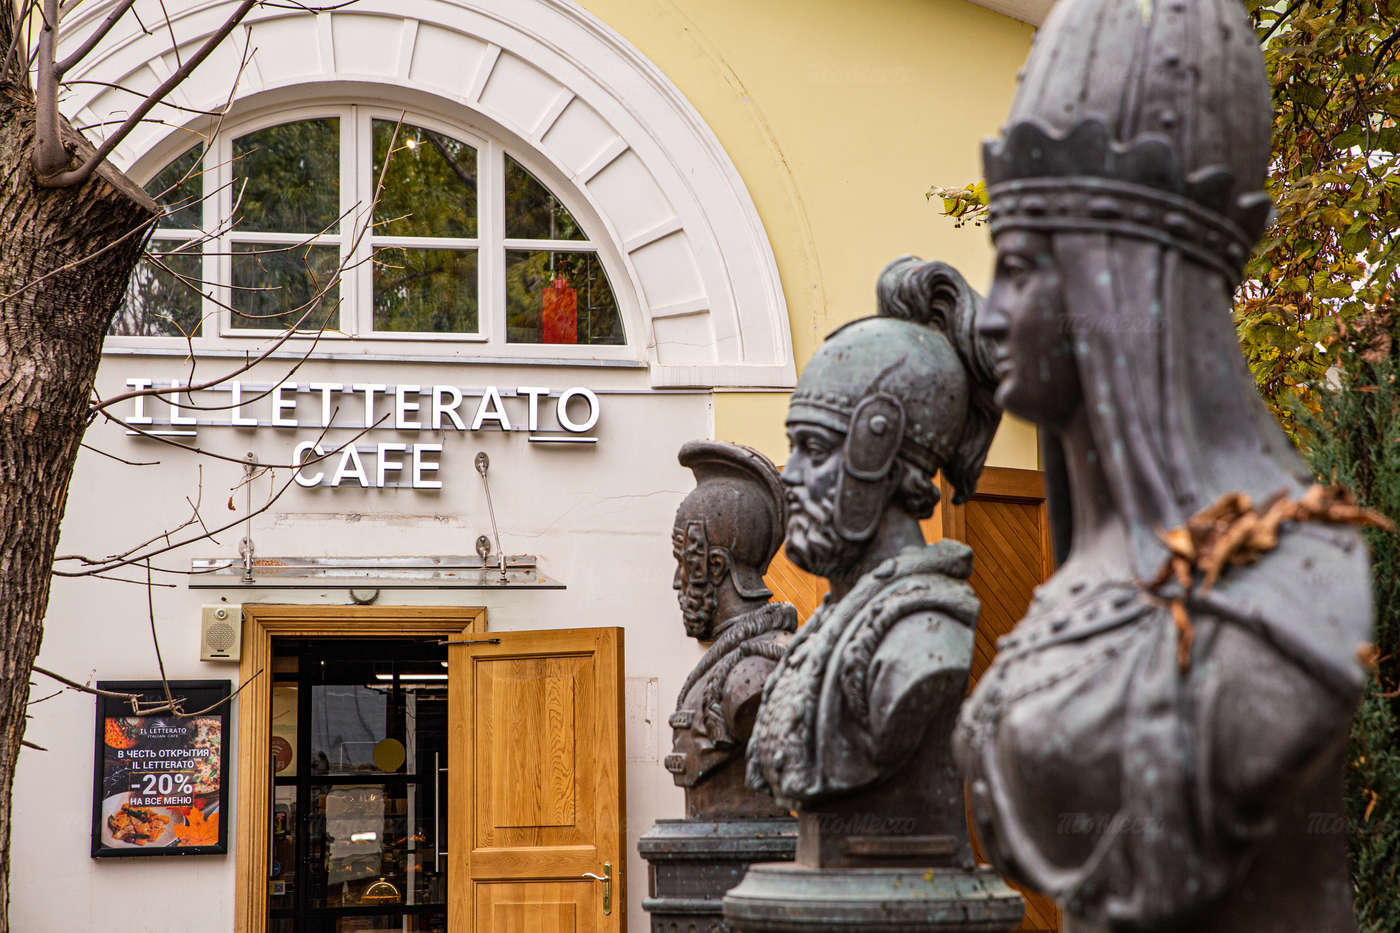 Ресторан IL LETTERATO (Литератор) в Петроверигском переулке фото 39